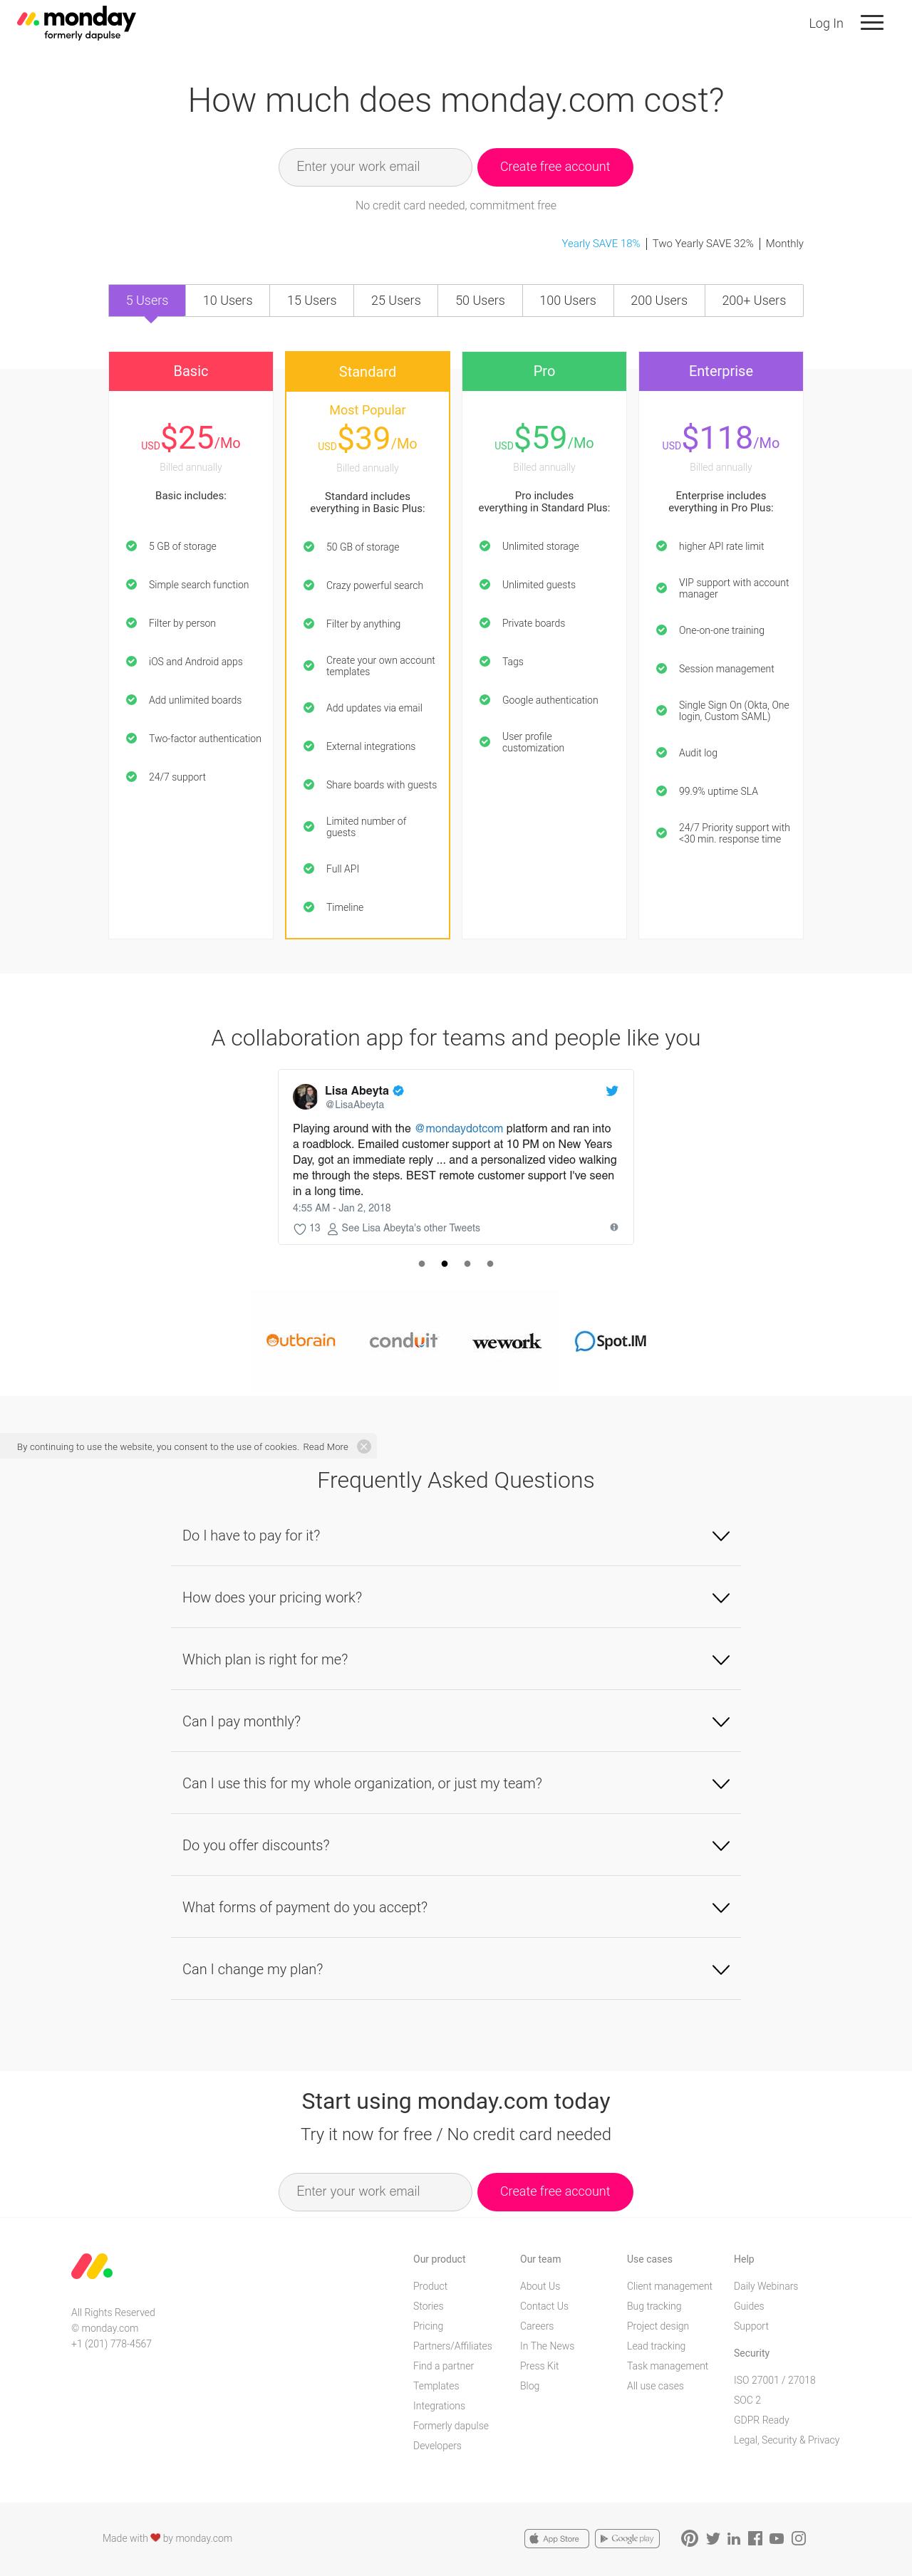 httpsmonday.compricing